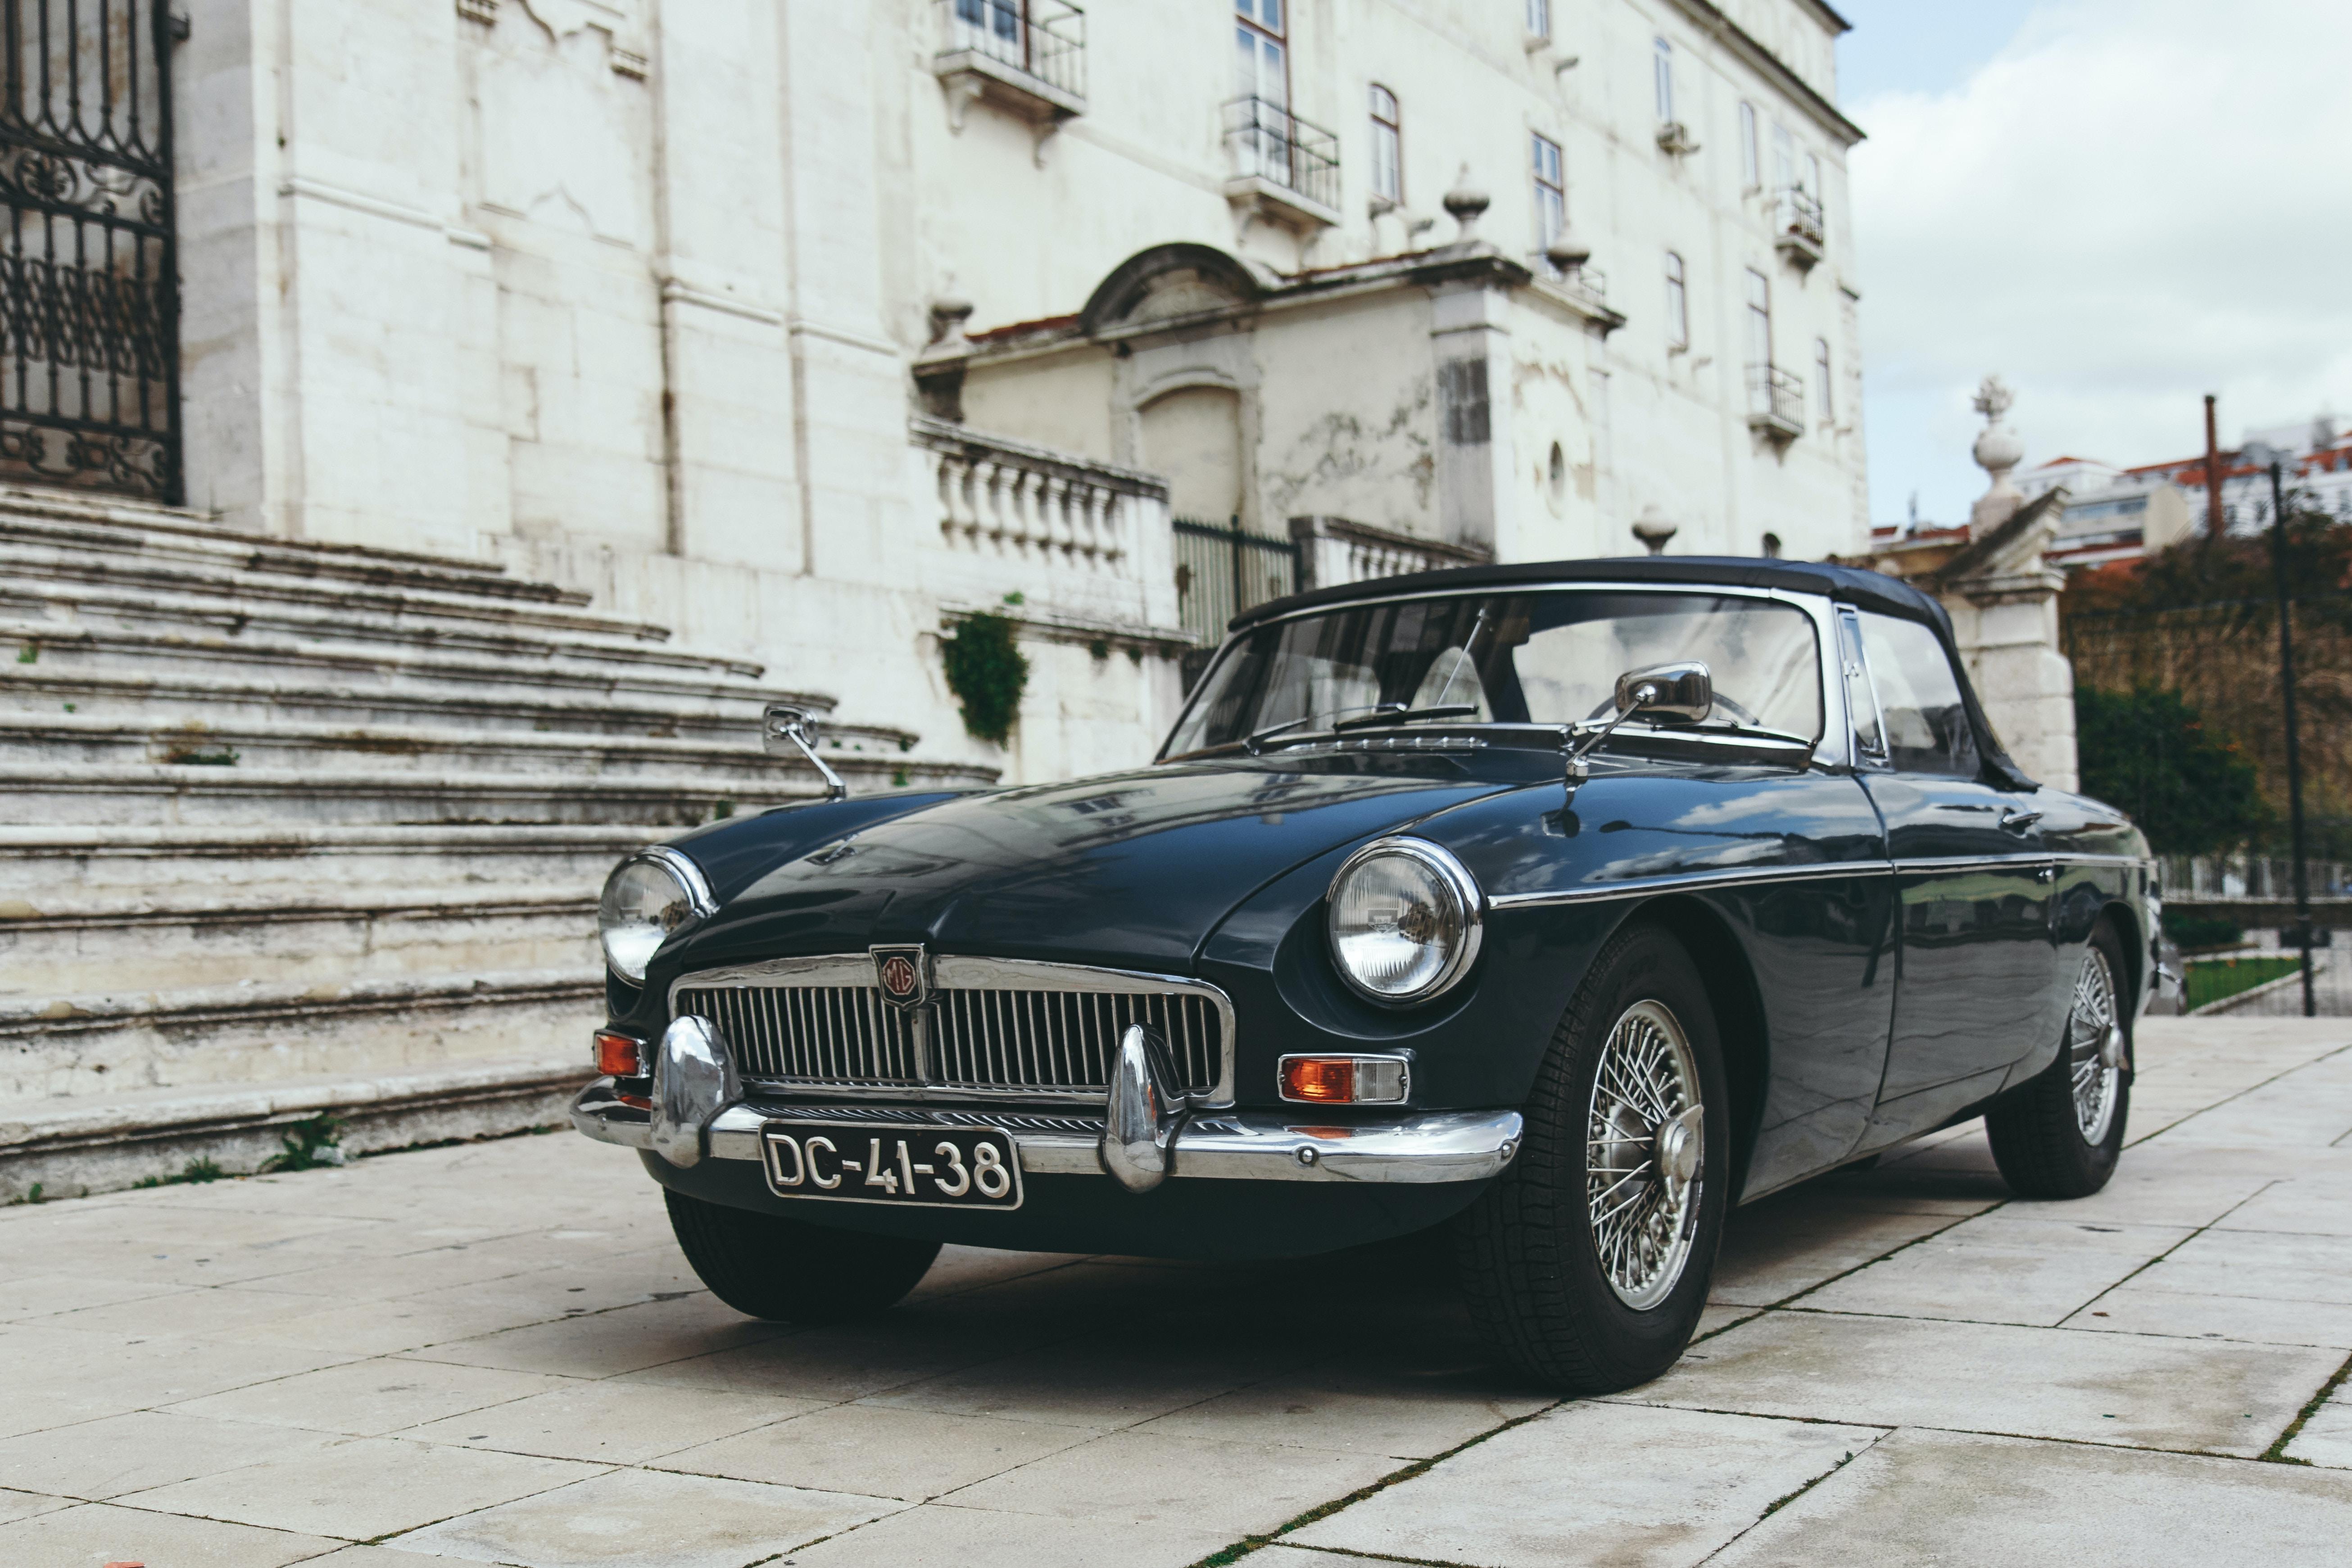 Vintage black car parked in front of a historic building in Lisbon.